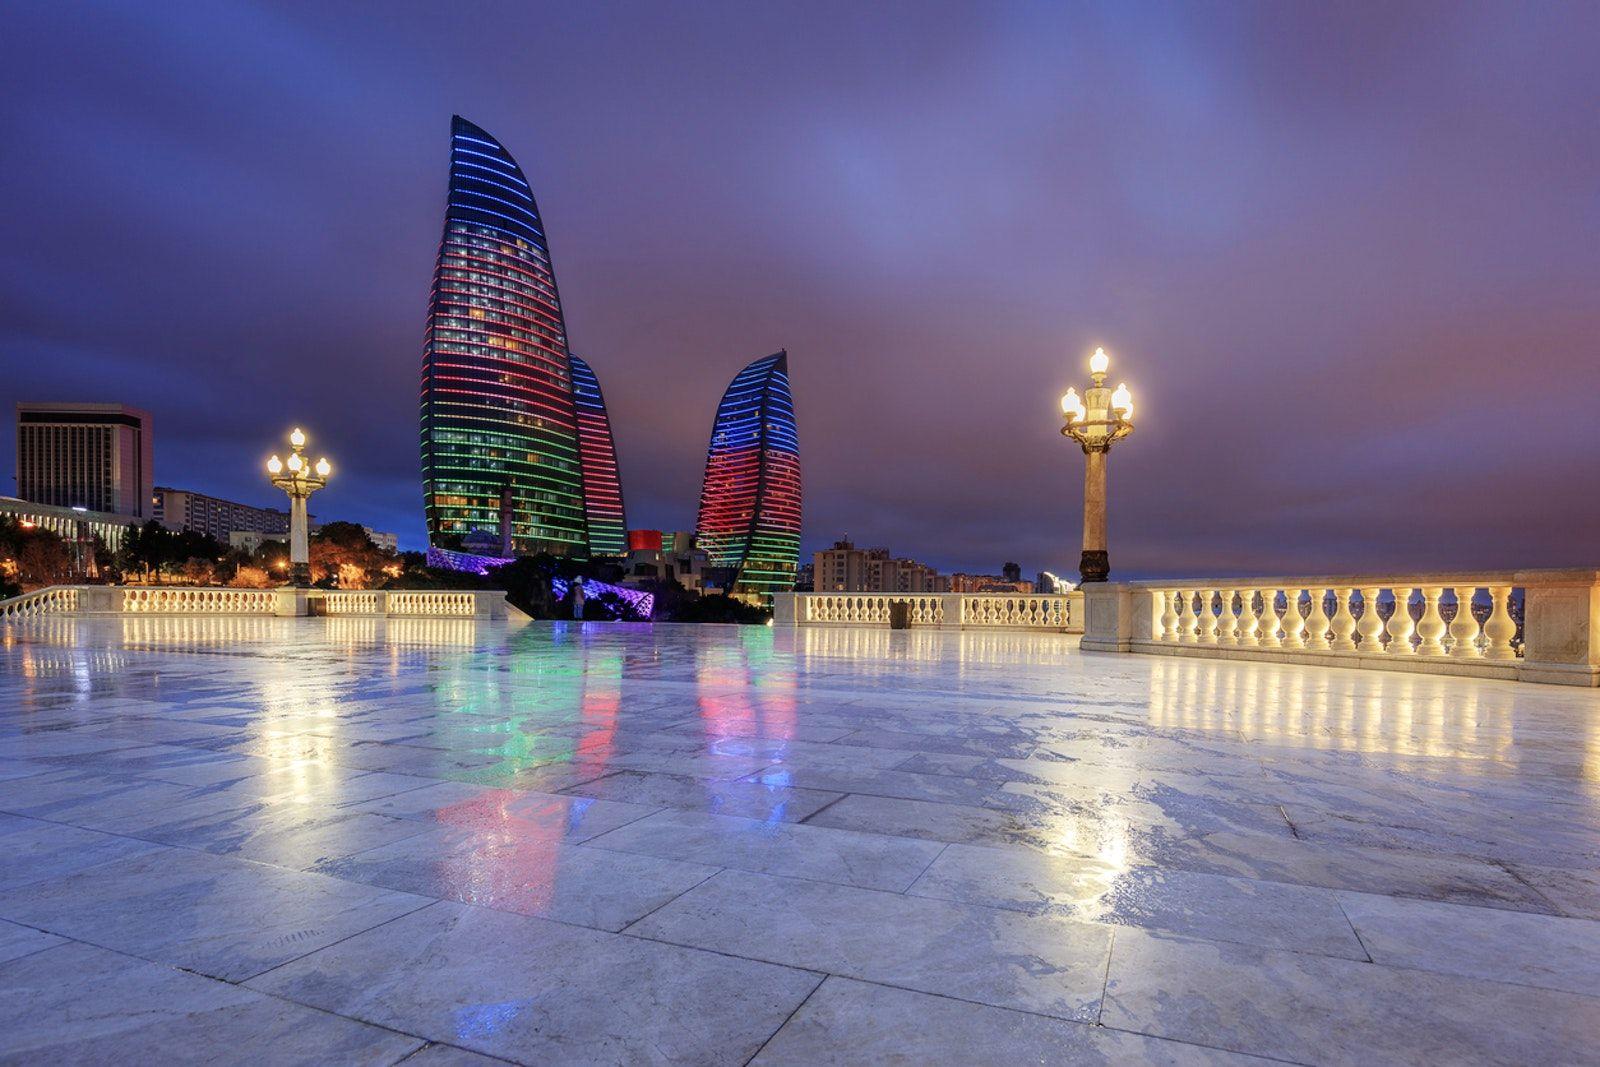 Visit Dagustu Park Highland Park Baku Baku City Night City Azerbaijan Travel